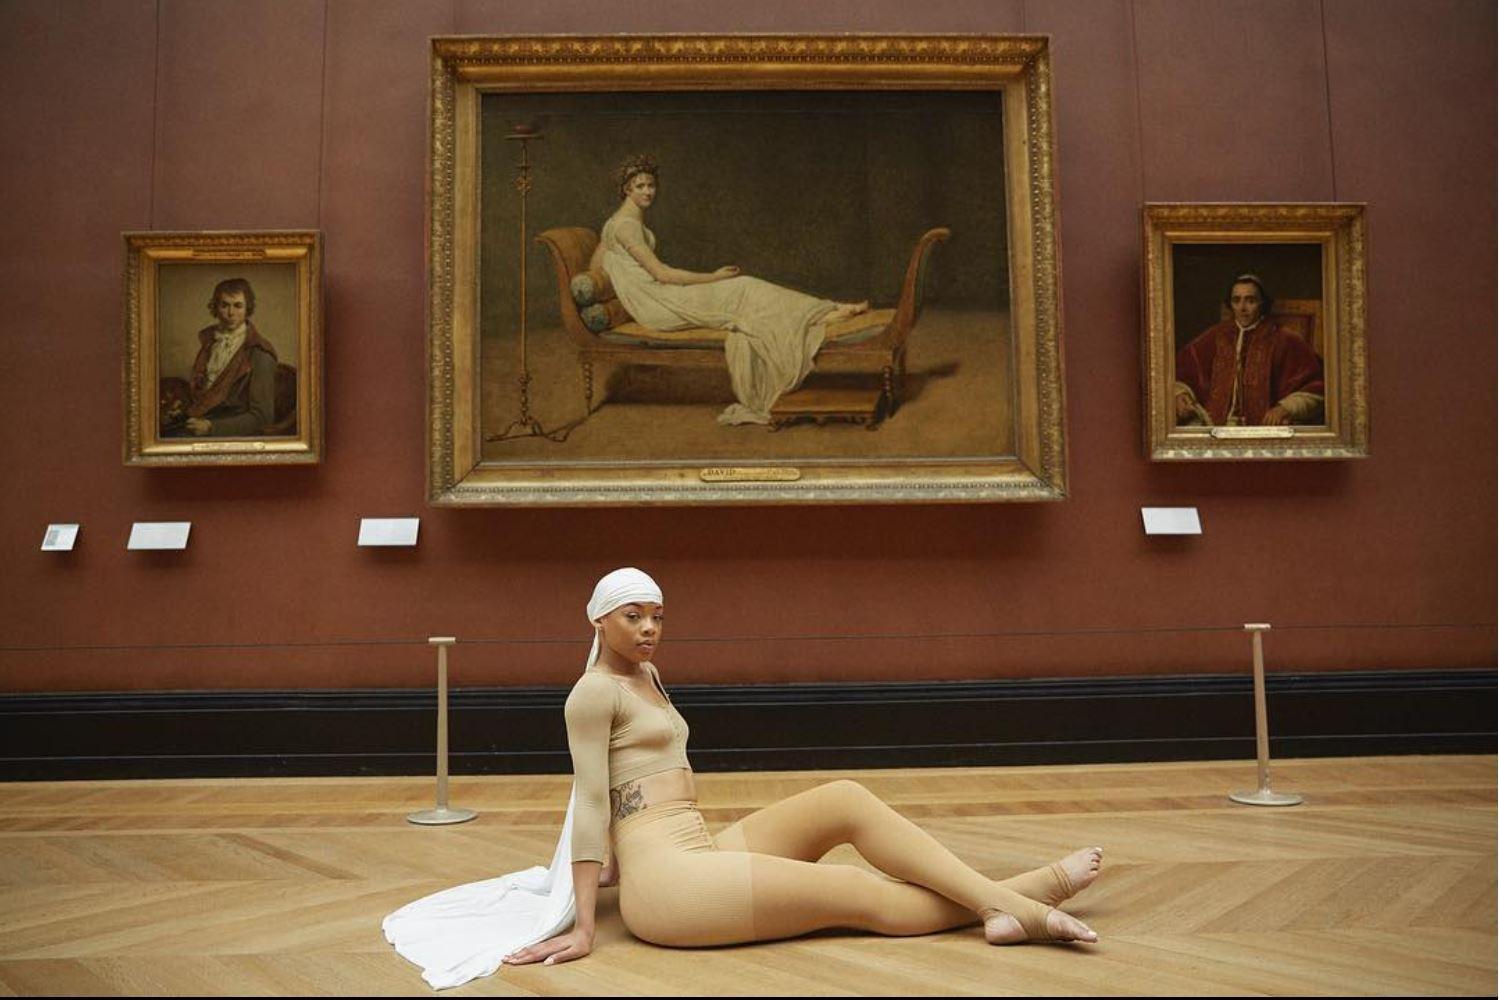 Jay-Z e Beyoncé, coppia glam tra le sale del Louvre in  Apeshit